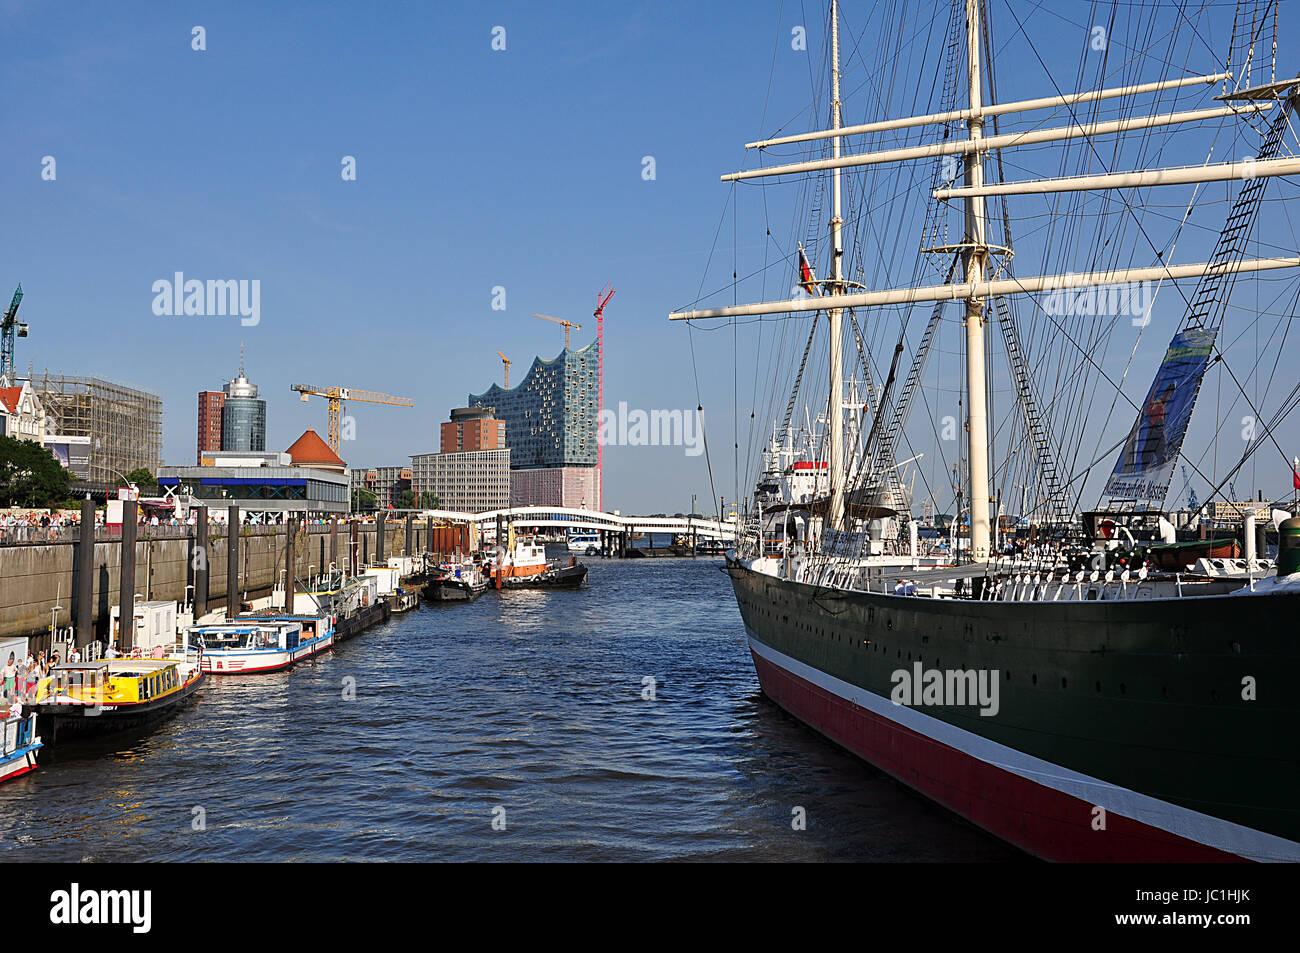 Segelboot in Hamburg Hamburg Stockbild